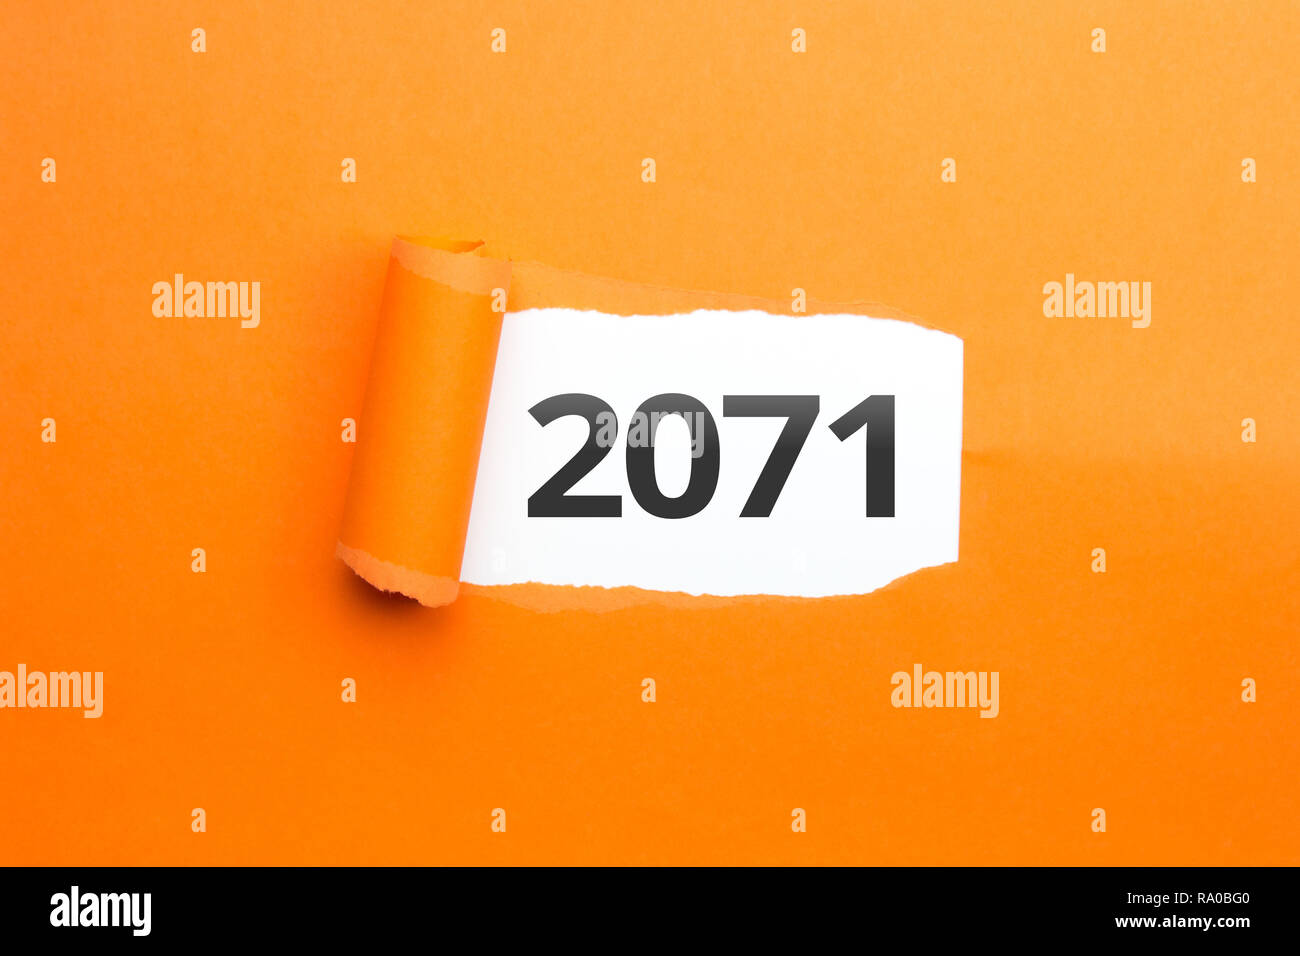 surprising Number / Year 2071 orange background - Stock Image